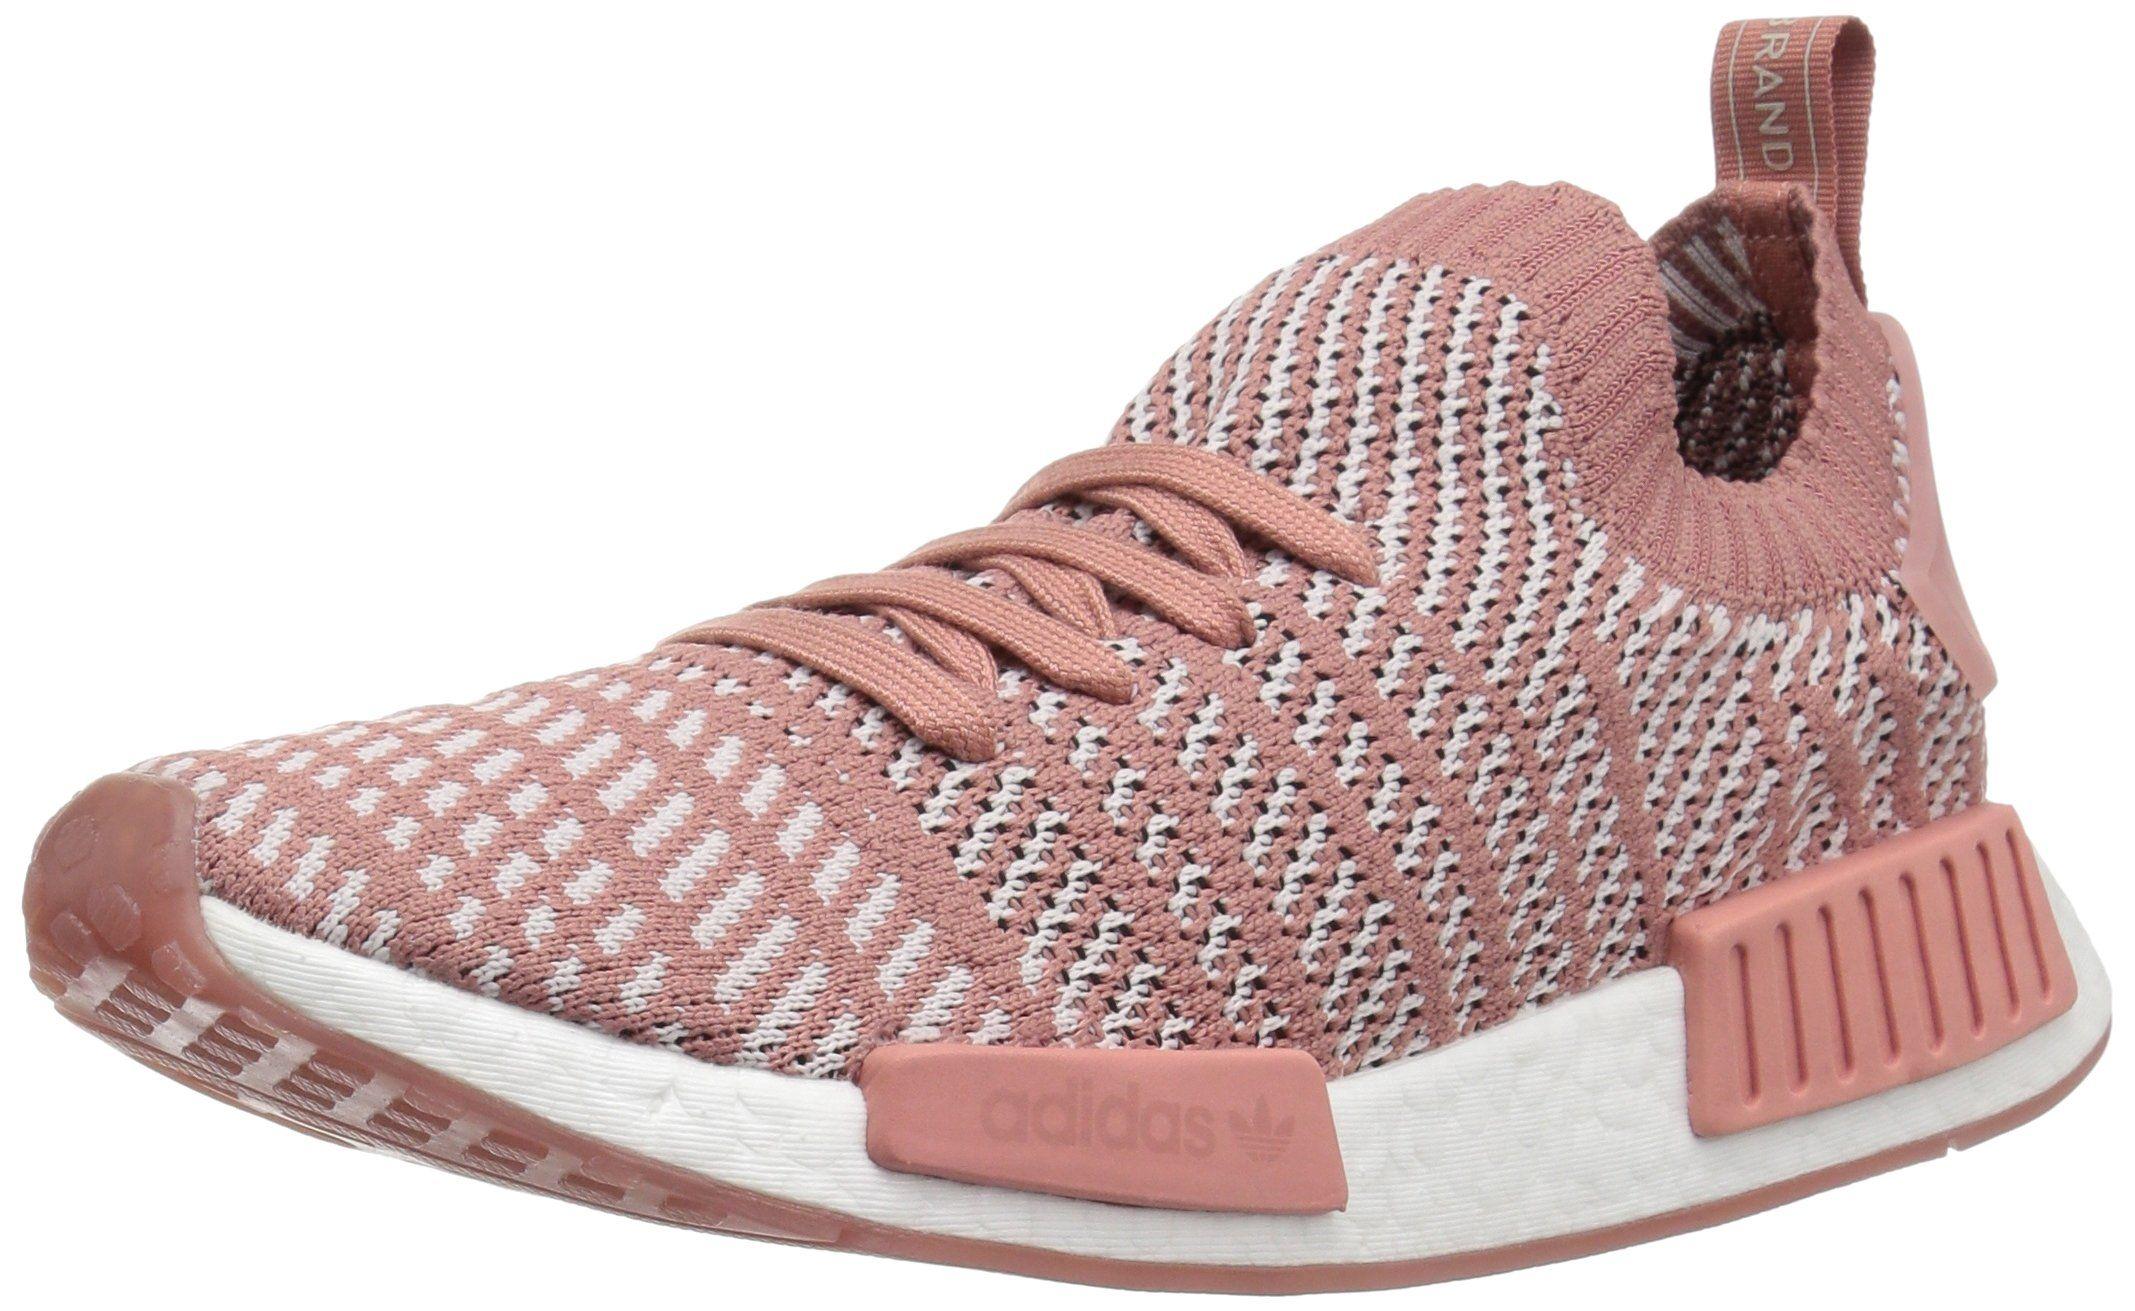 811492b362fa1 Amazon.com | adidas Originals Women's NMD_r1 Stlt Pk | Fashion ...